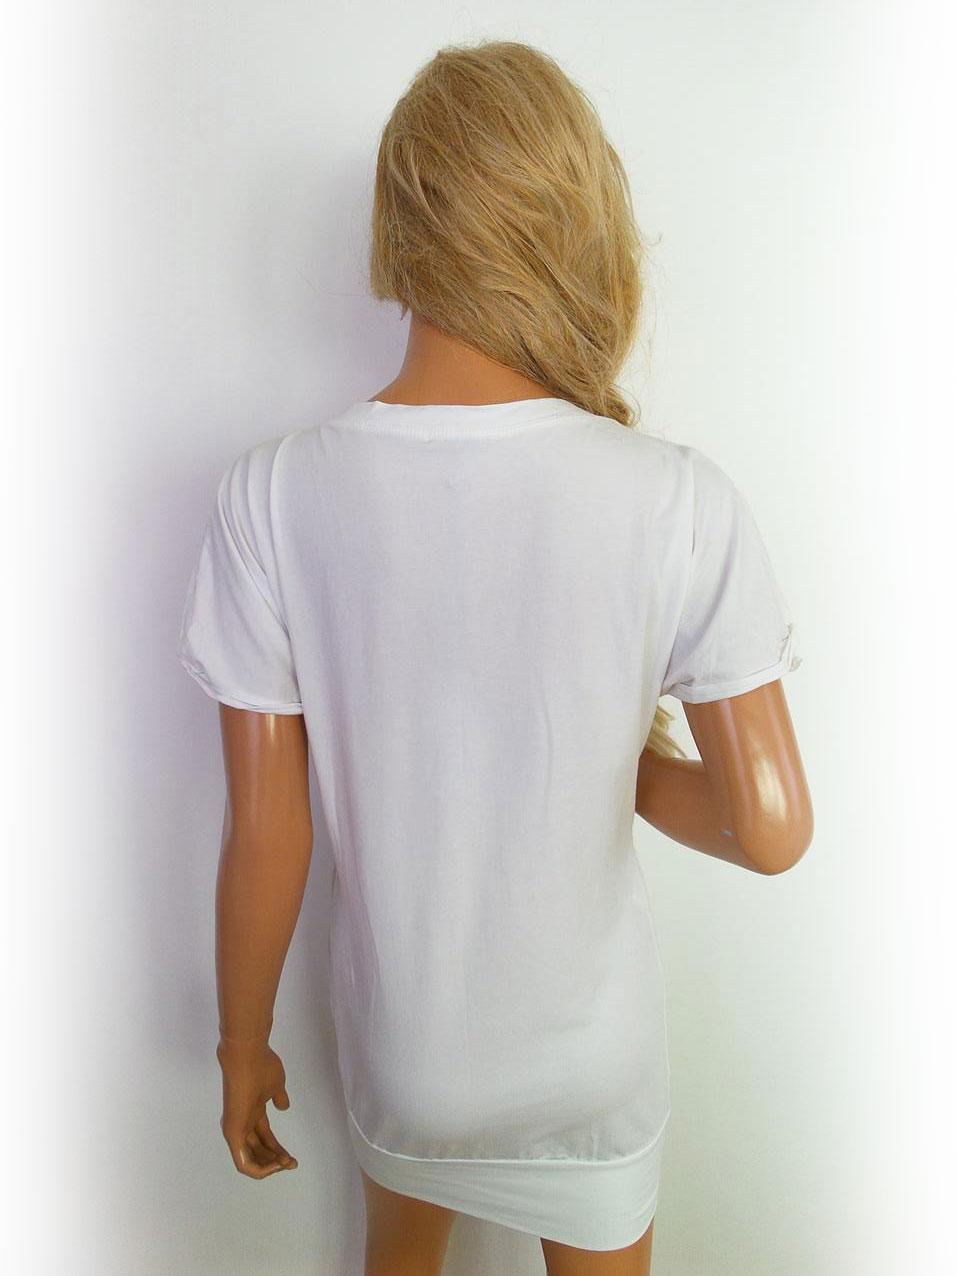 Guarapo-Womens-Frauen-Dame-Groesse-S-Neu-White-Shift-Kleid-Kurze-Armel Indexbild 3